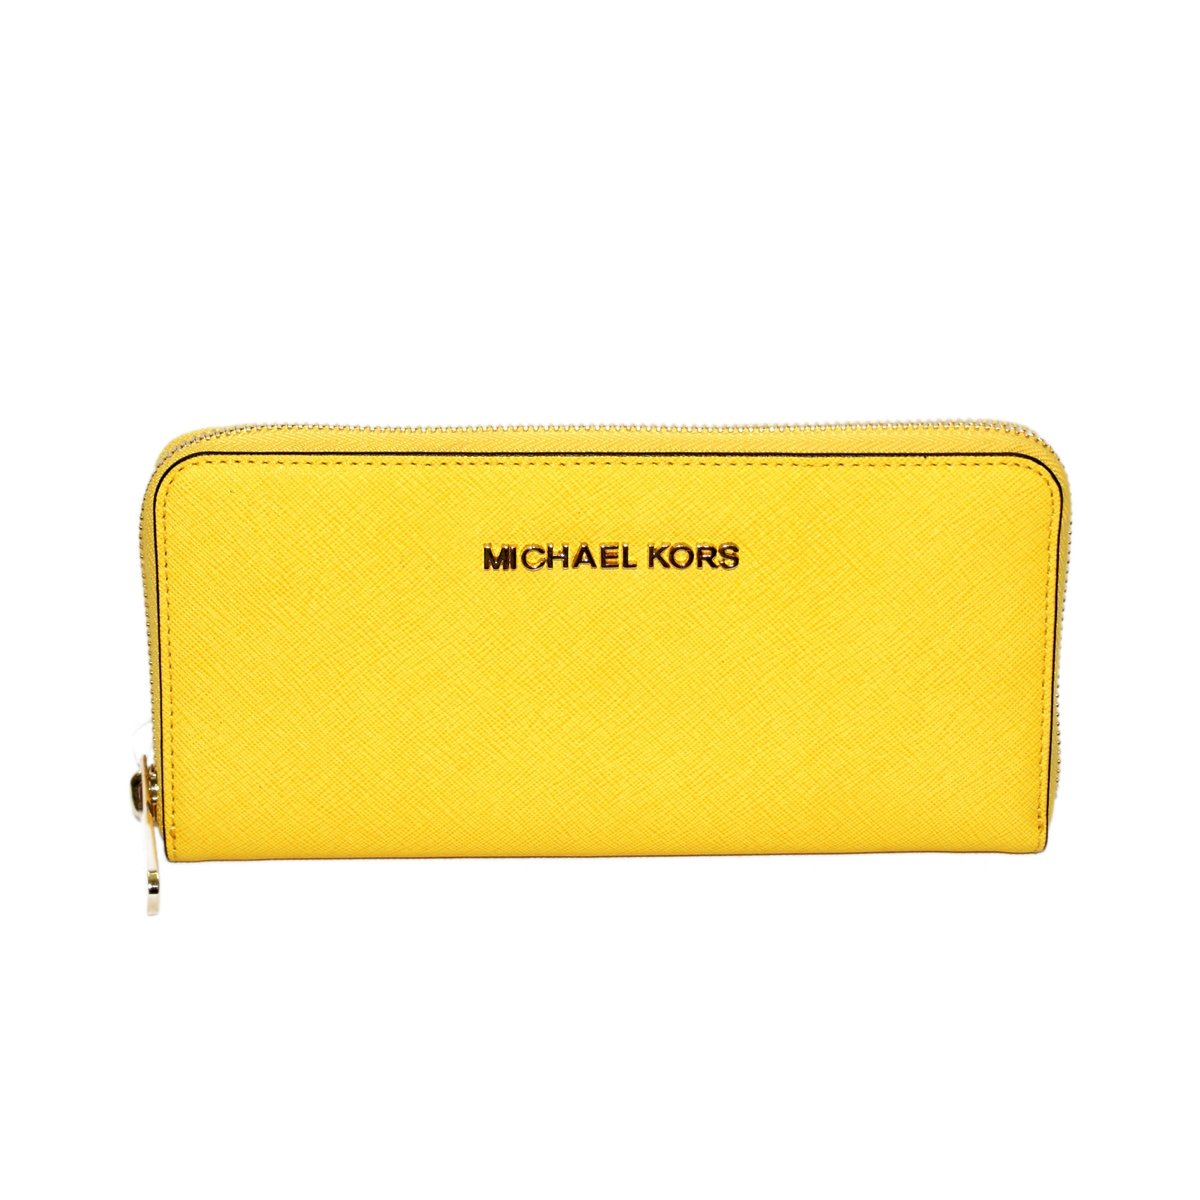 736f46366581 Michael Kors Jet Set Travel /continental Genuine Leather Wallet/ Clutch  Citrus (Yellow) #32S3GTVE3L: Handbags: Amazon.com